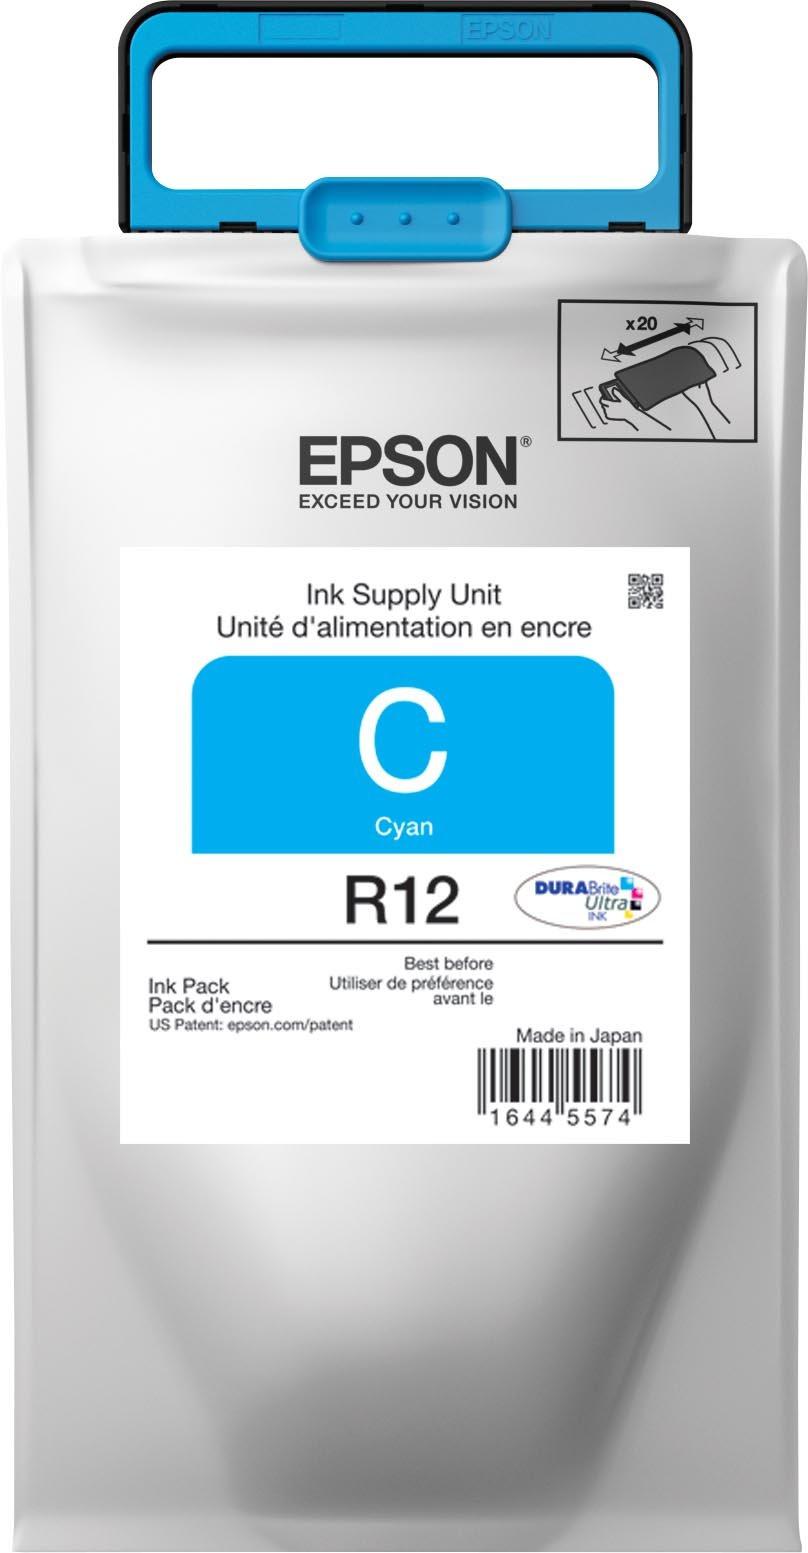 Epson DURABrite Ultra Standard Capacity, Cyan Ink (TR12220) by Epson (Image #1)